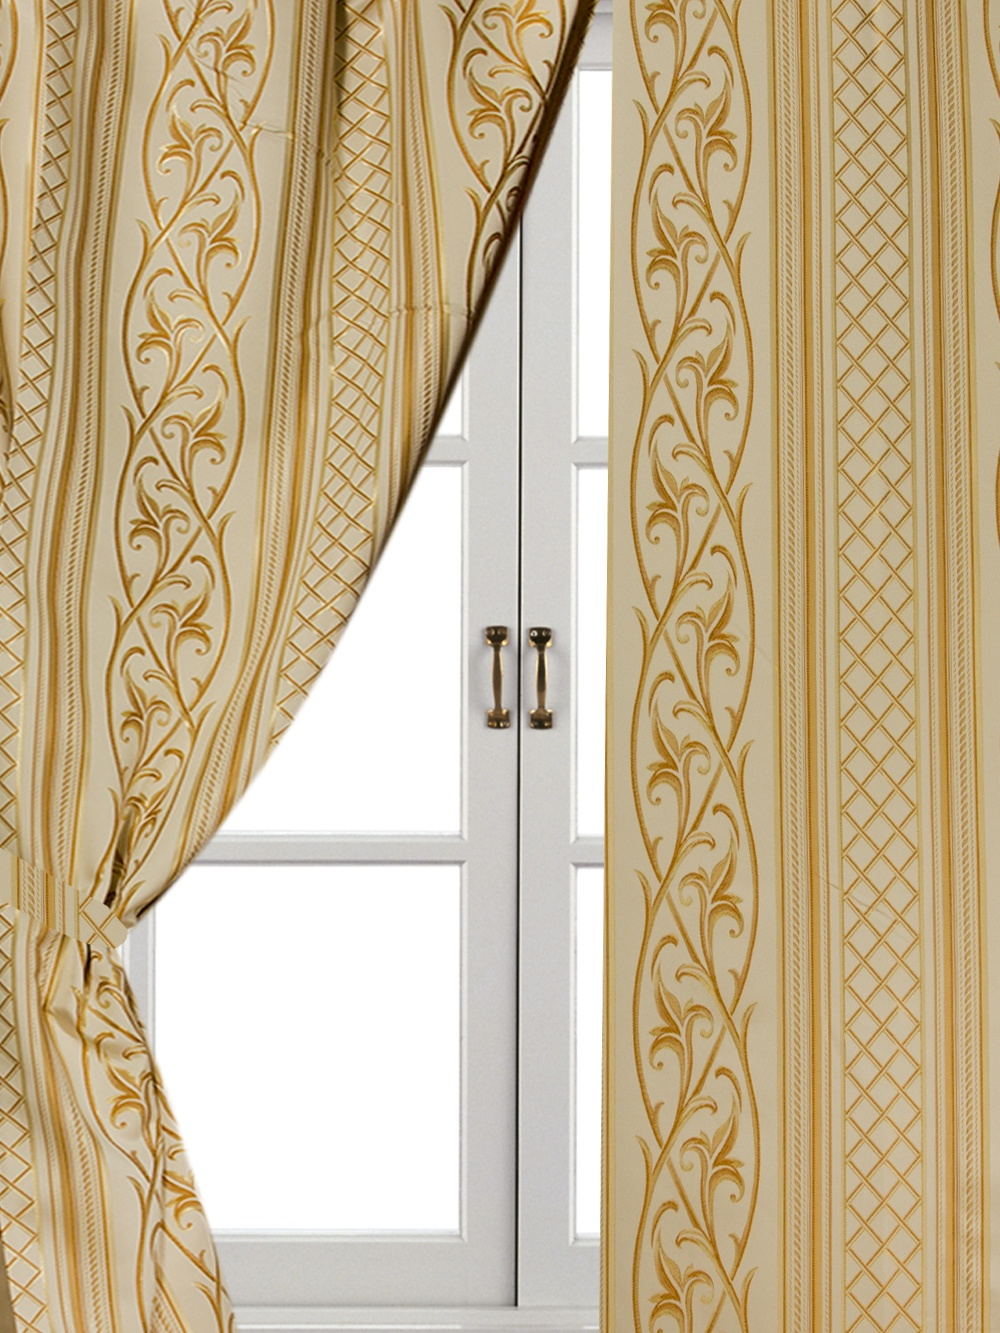 Шторы комнатные Айлант ОБ36 шторы homedeco нитяные шторы яркие кольца